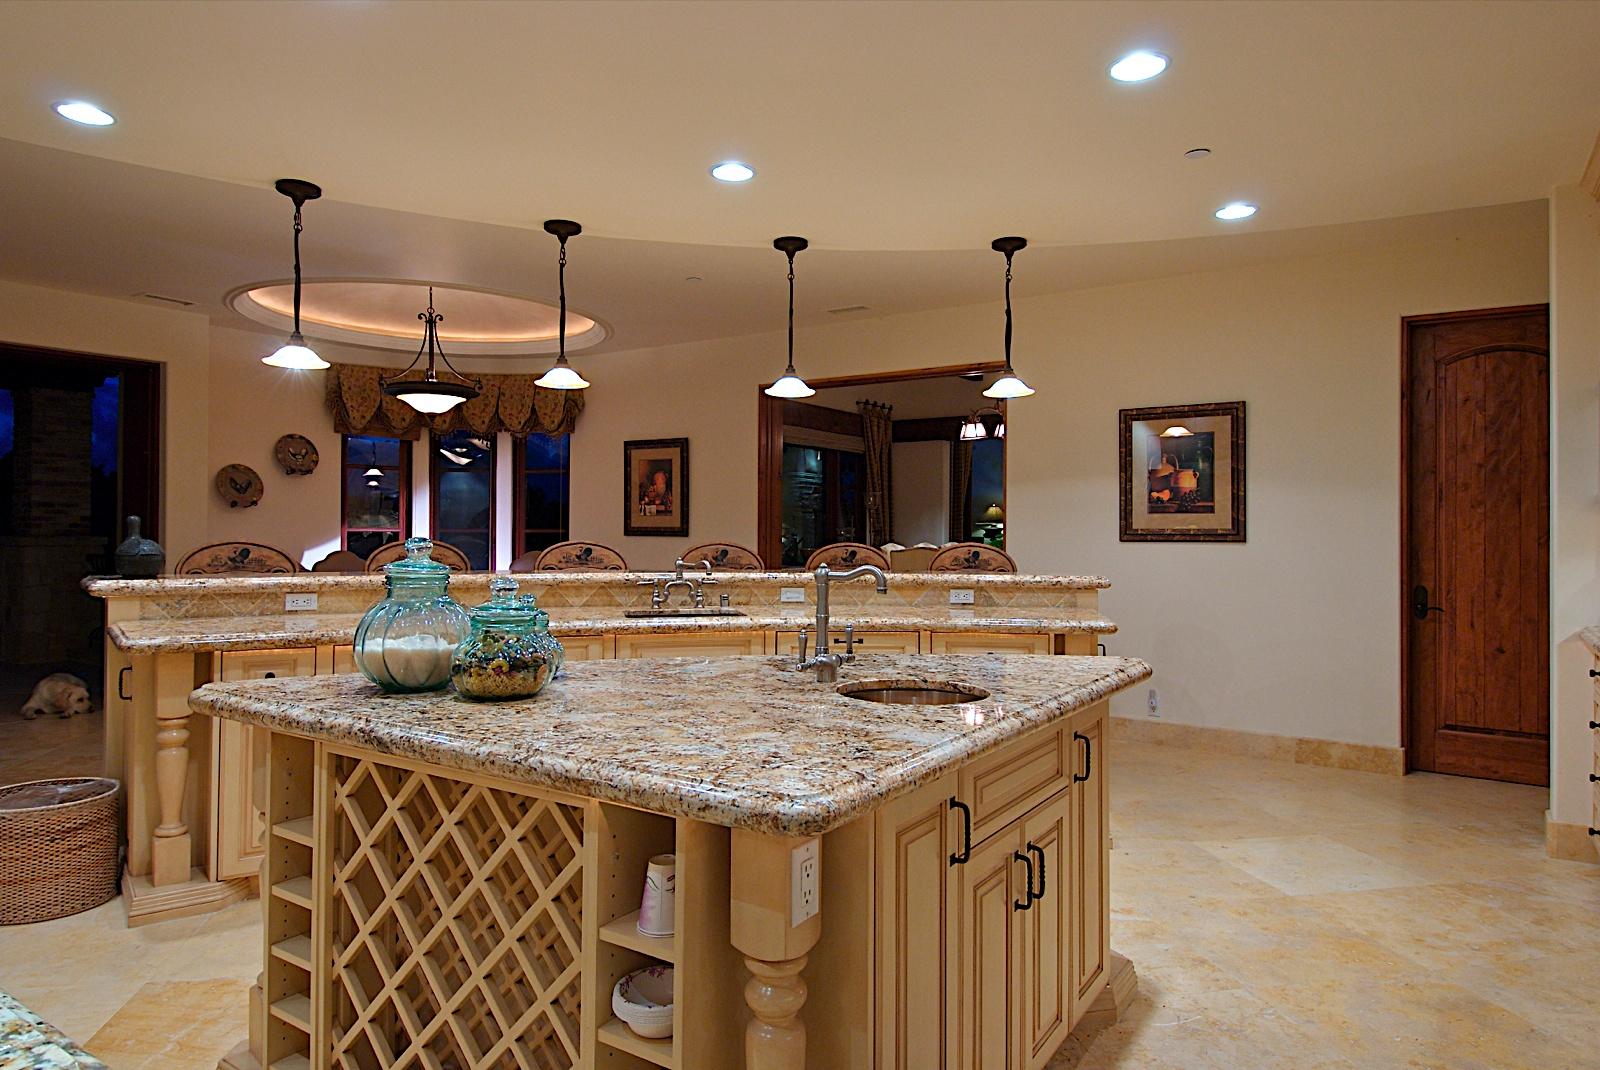 15 brilliant ideas for proper kitchen lighting kitchen lighting